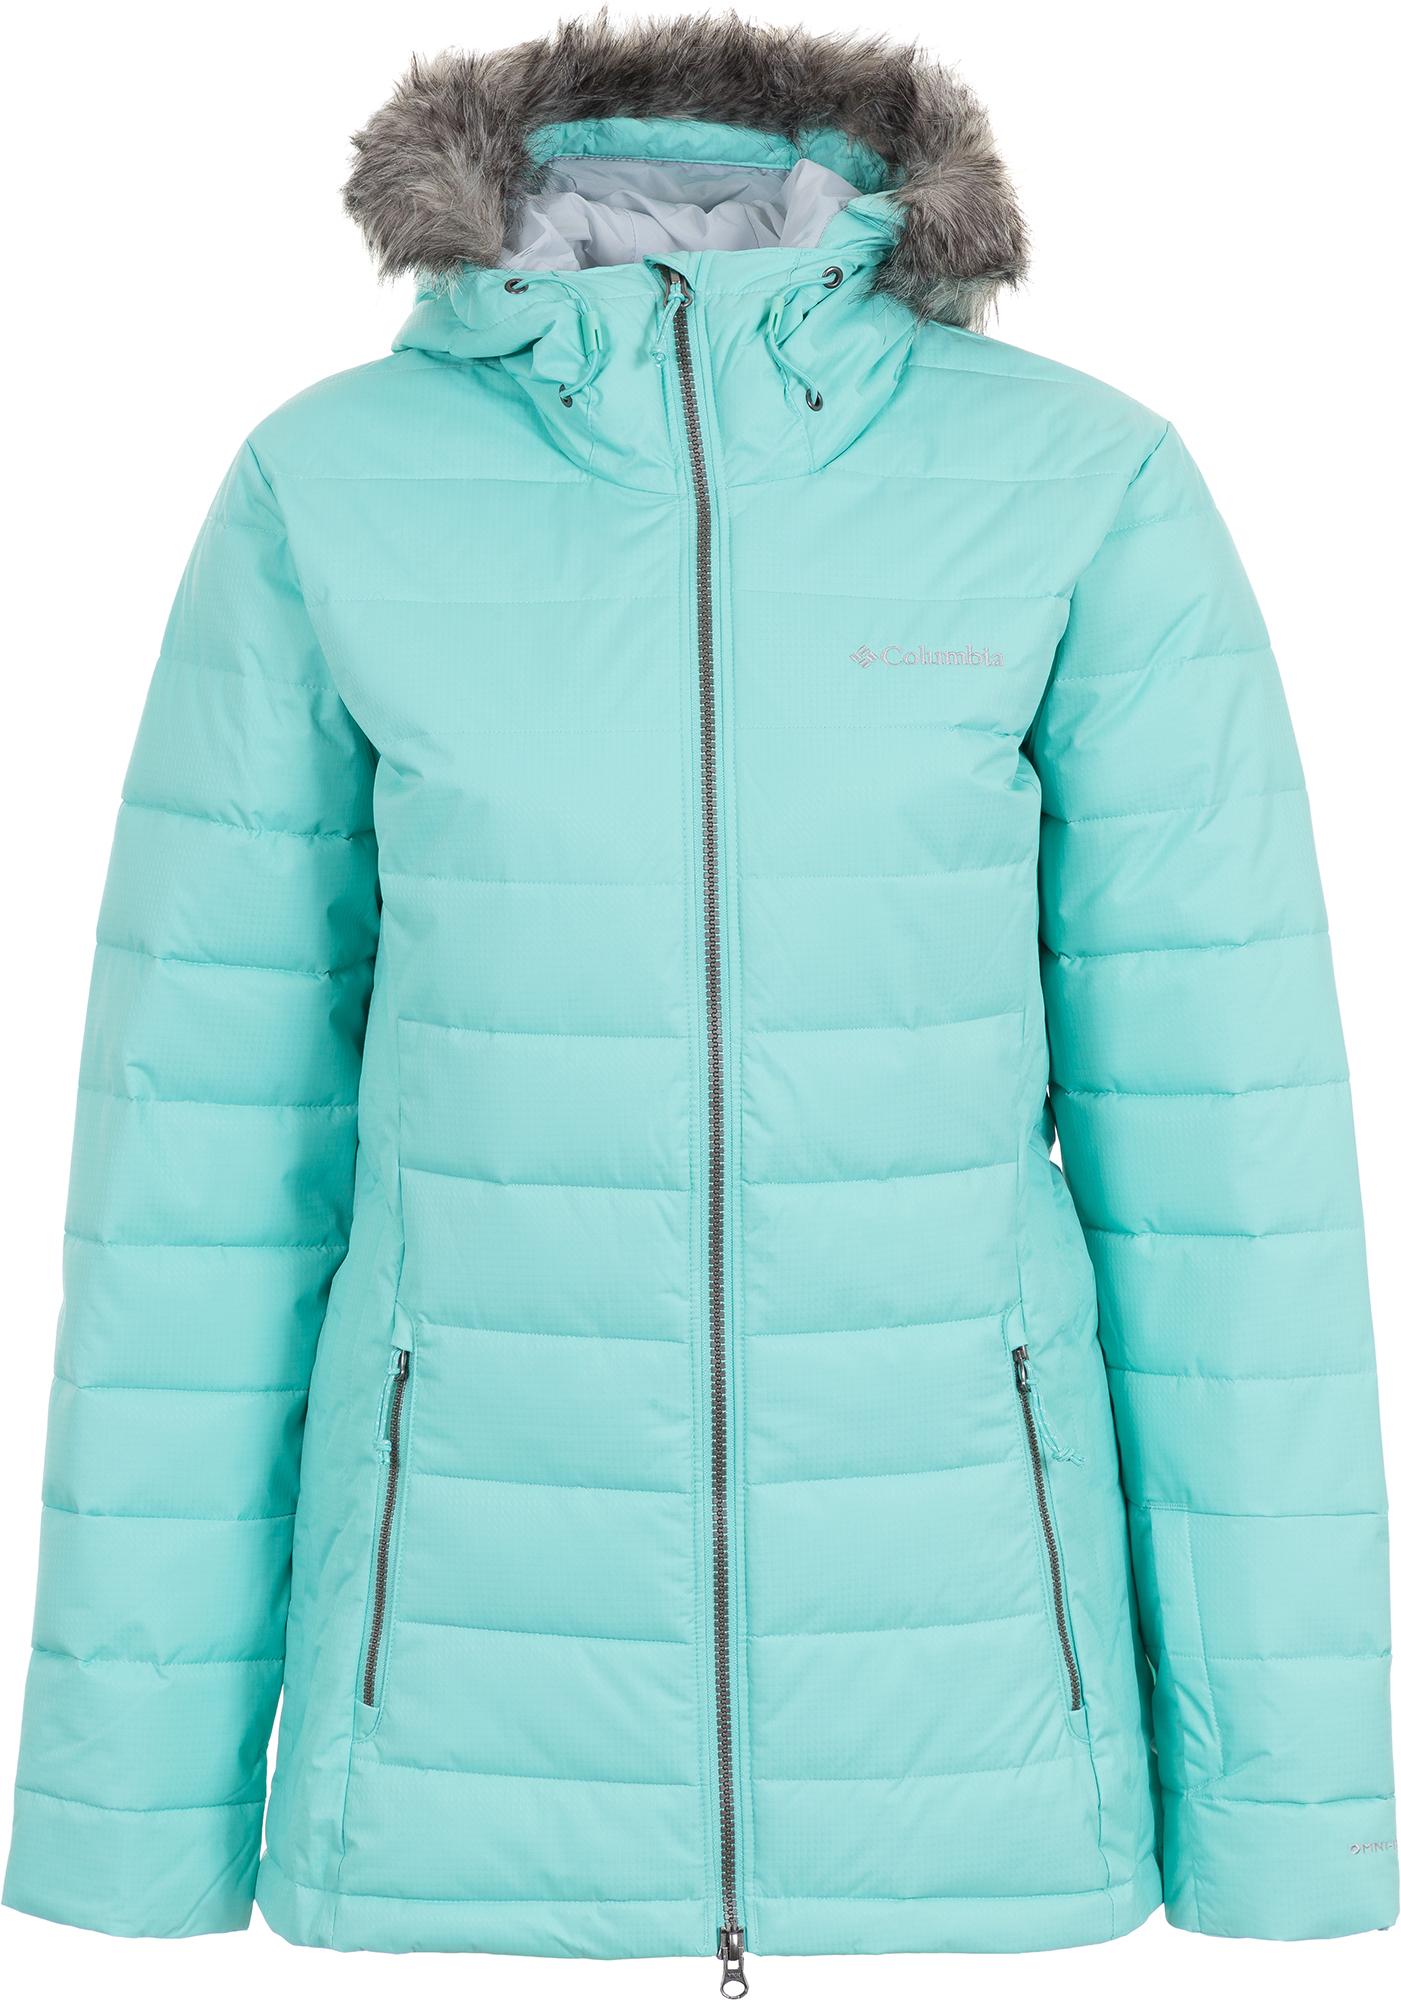 Columbia Куртка утепленная женская Columbia Ash Meadows, размер 42